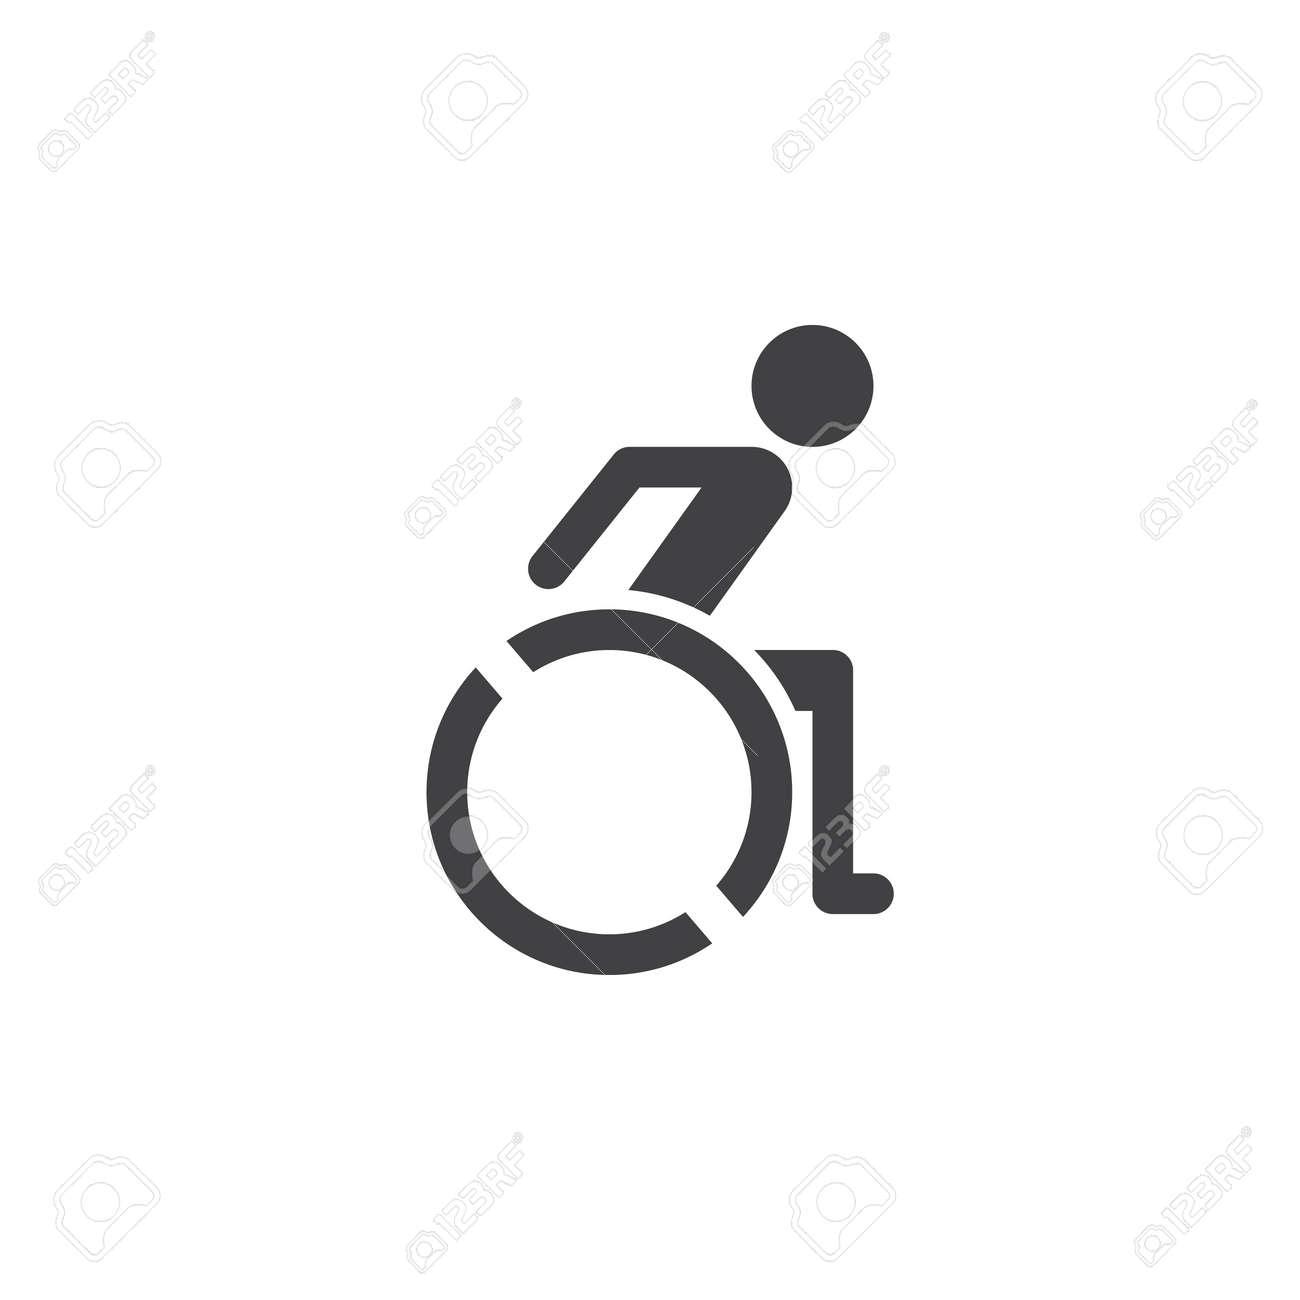 wheelchair icon vector handicap solid logo illustration pictogram